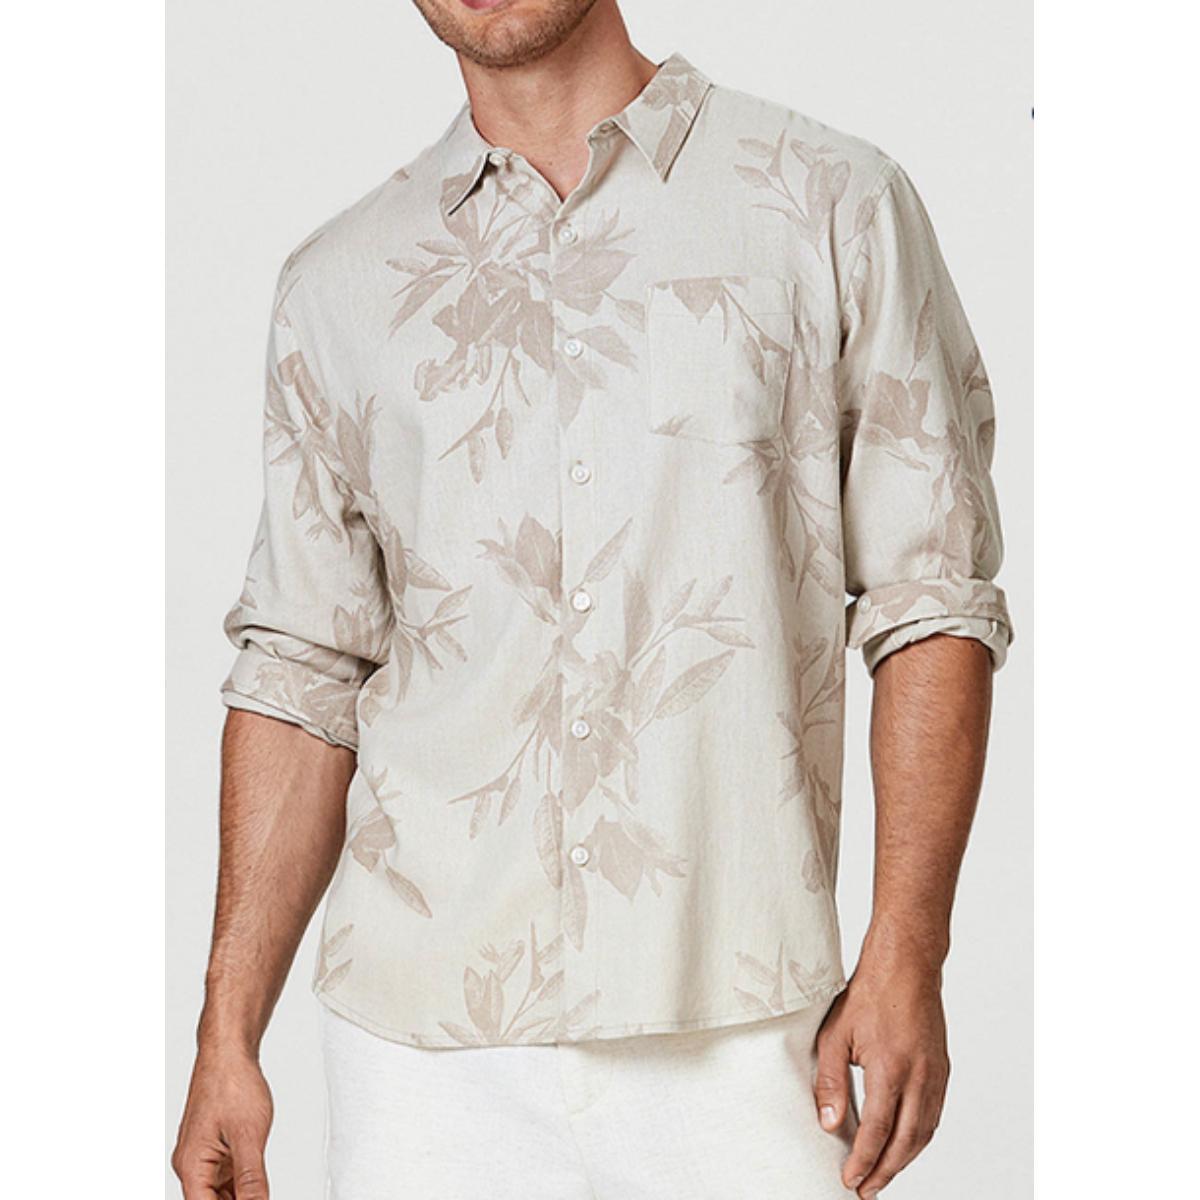 Camisa Masculina Hering Ktz4 1fsi Bege Estampado